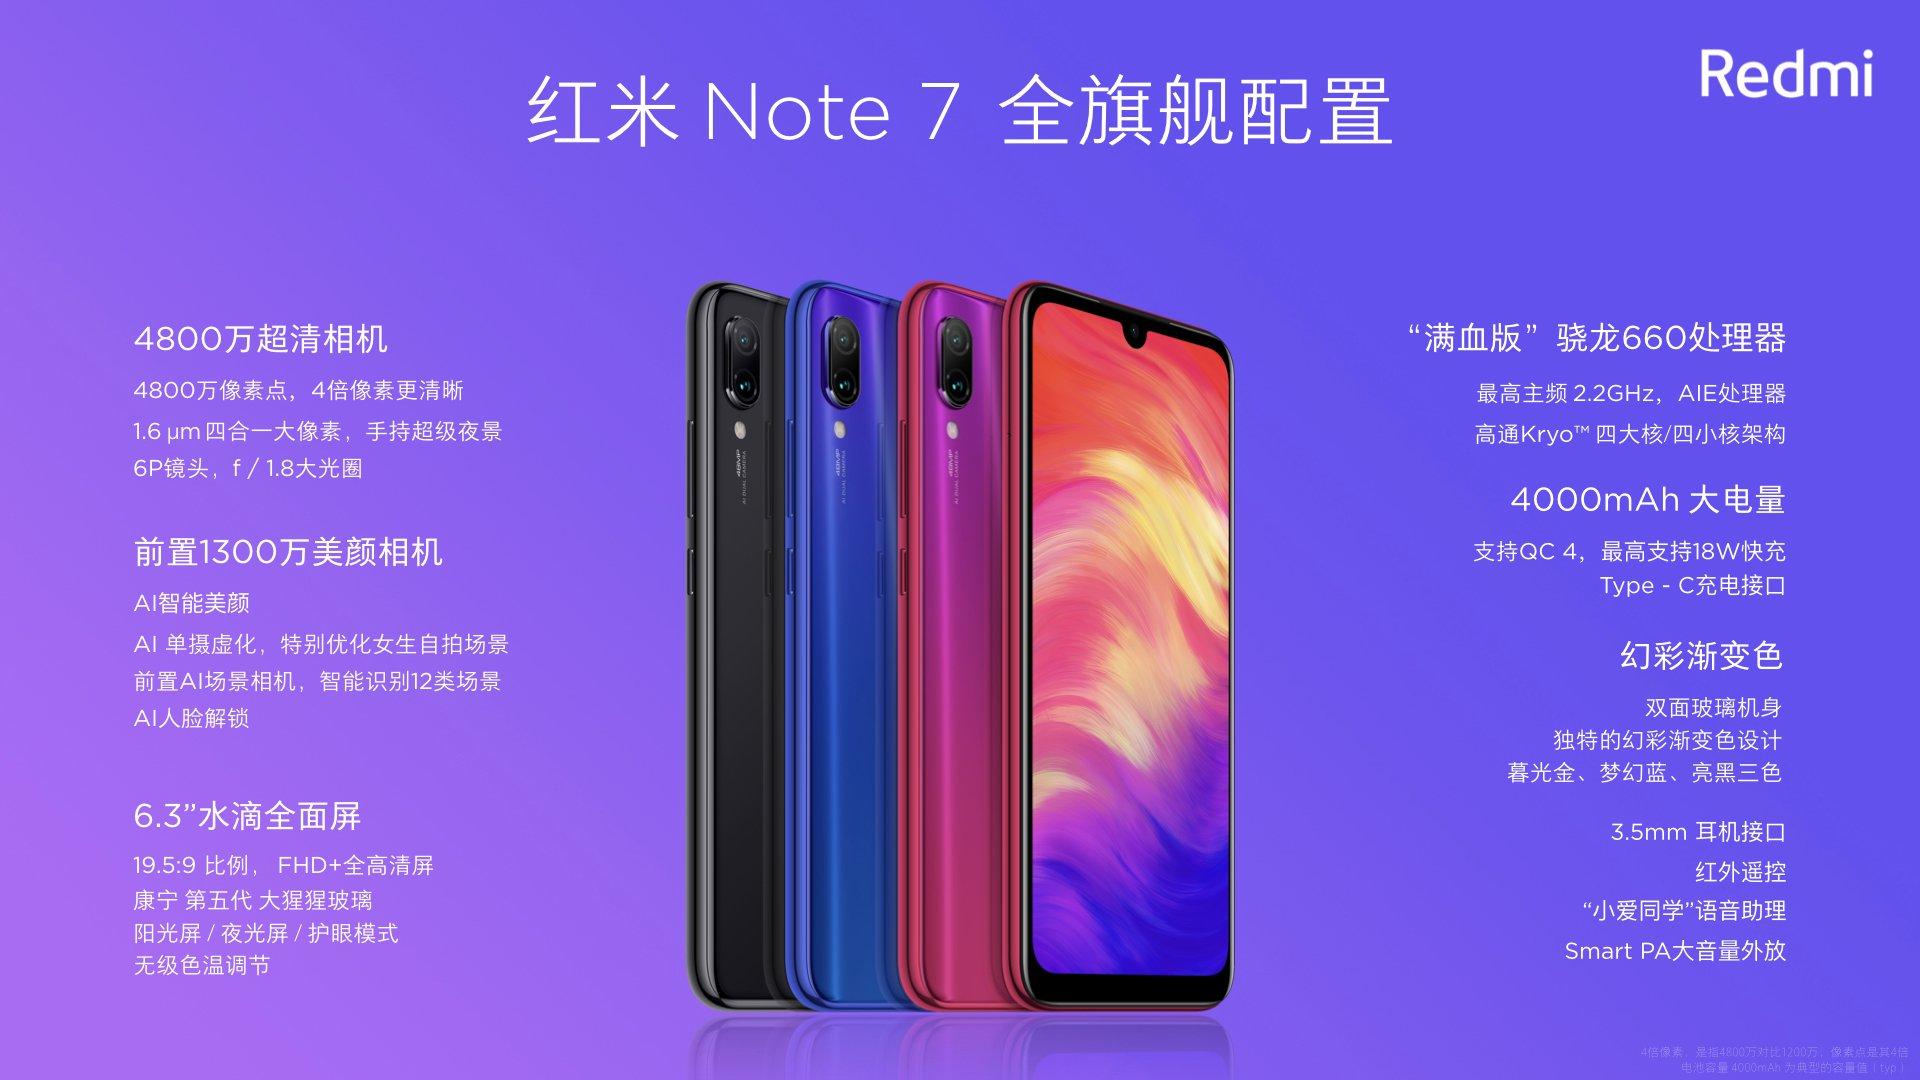 Redmi Note 7 краткий обзор спецификаций